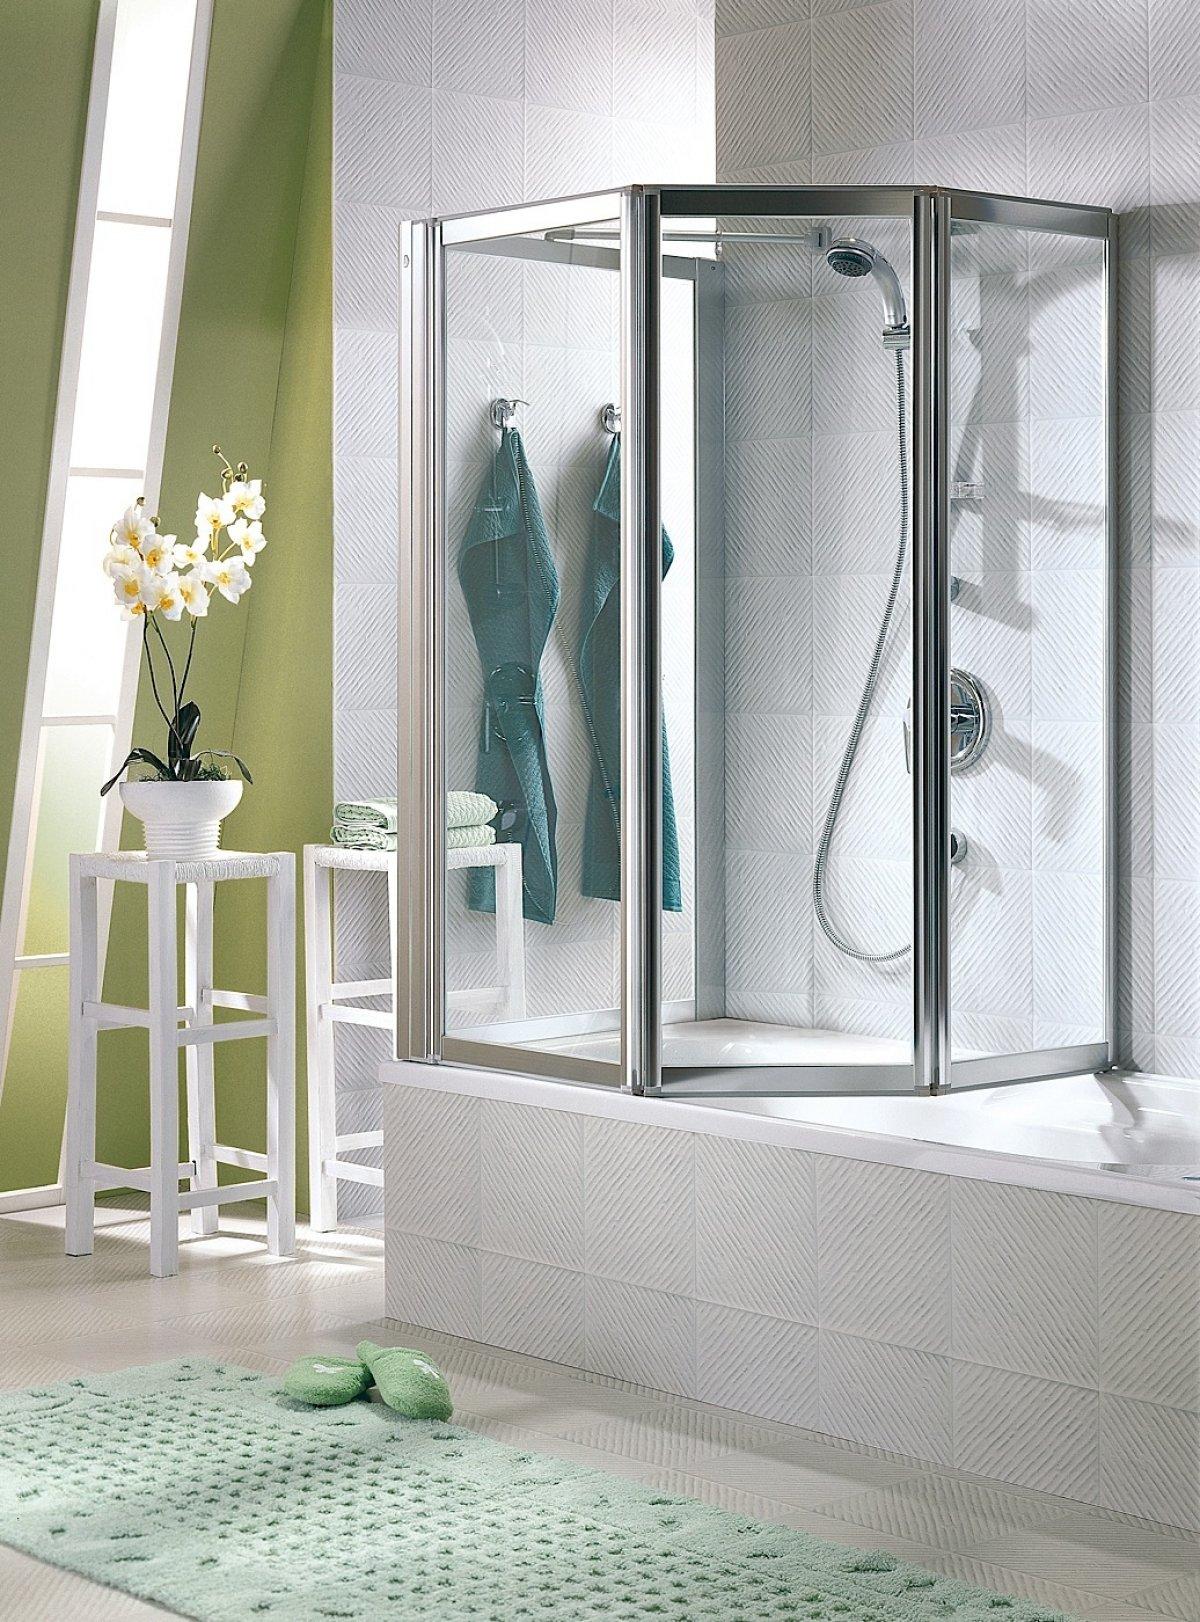 badewannenfaltwand duschwand badewanne duka. Black Bedroom Furniture Sets. Home Design Ideas